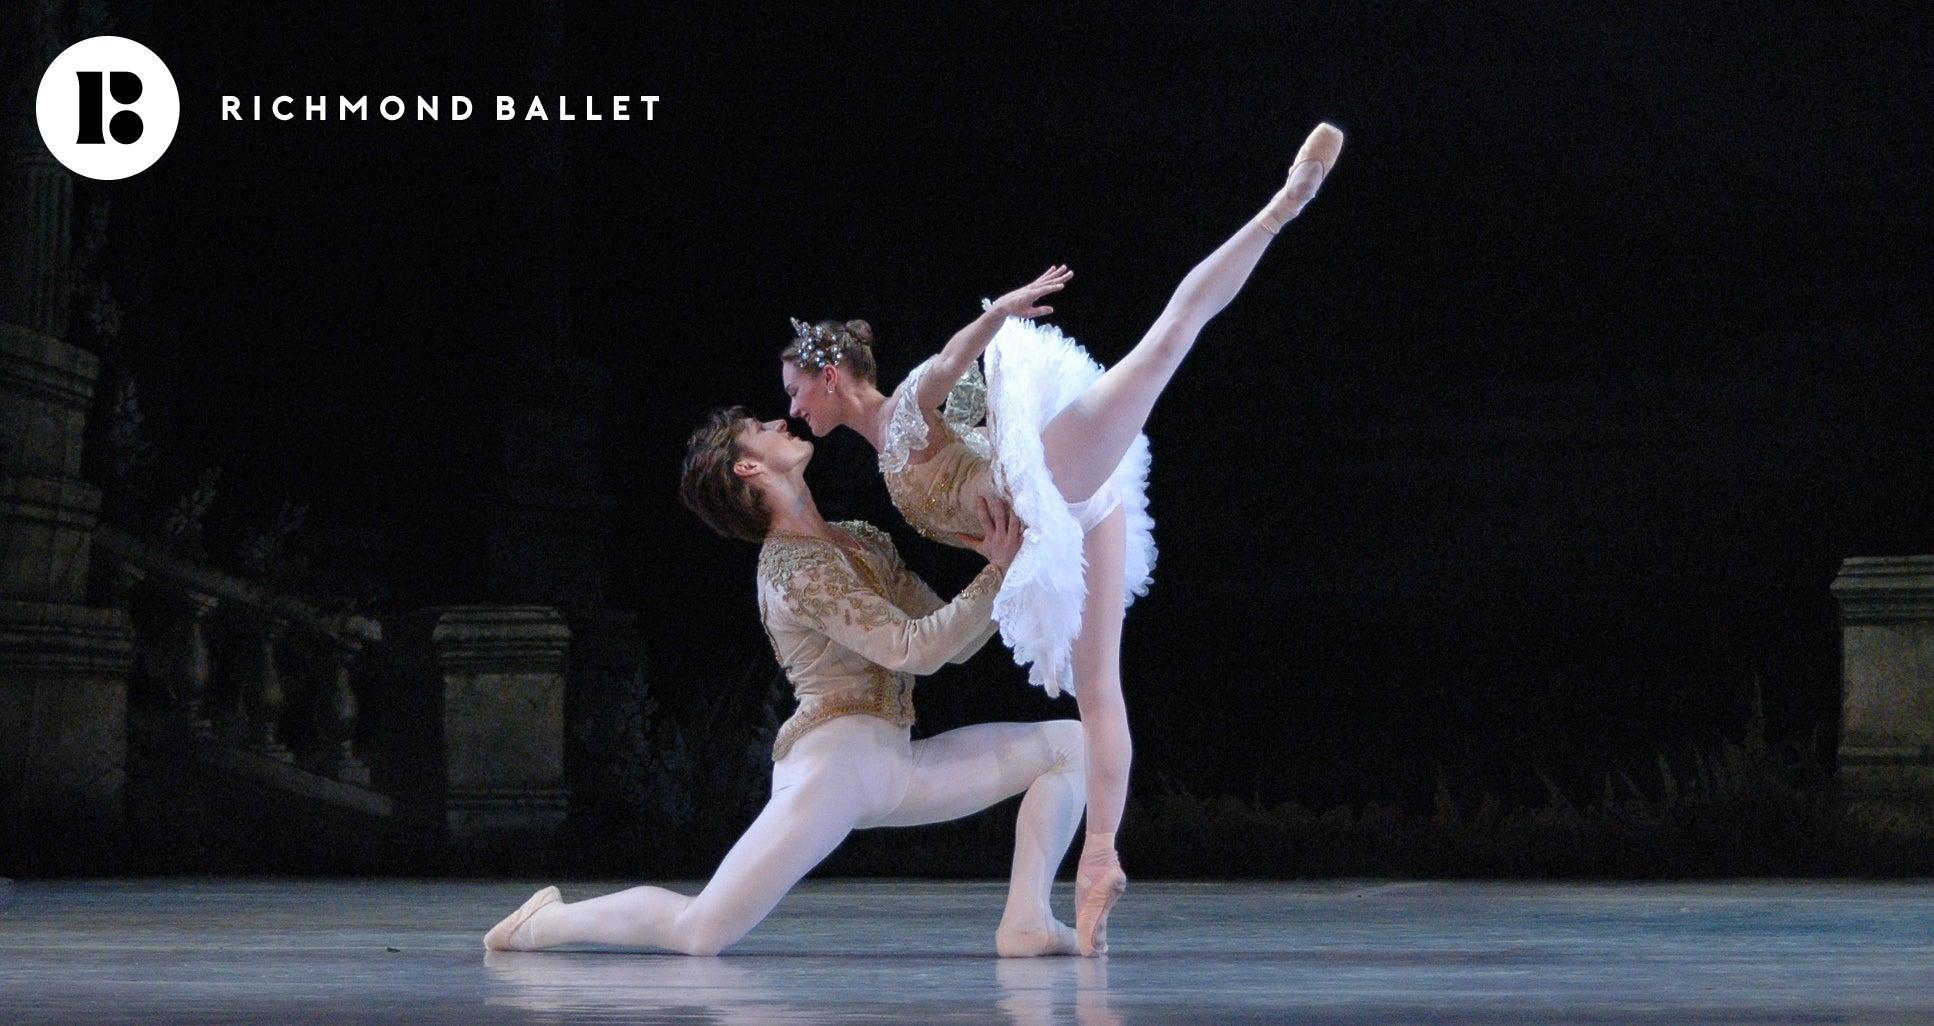 Richmond Ballet's Sleeping Beauty